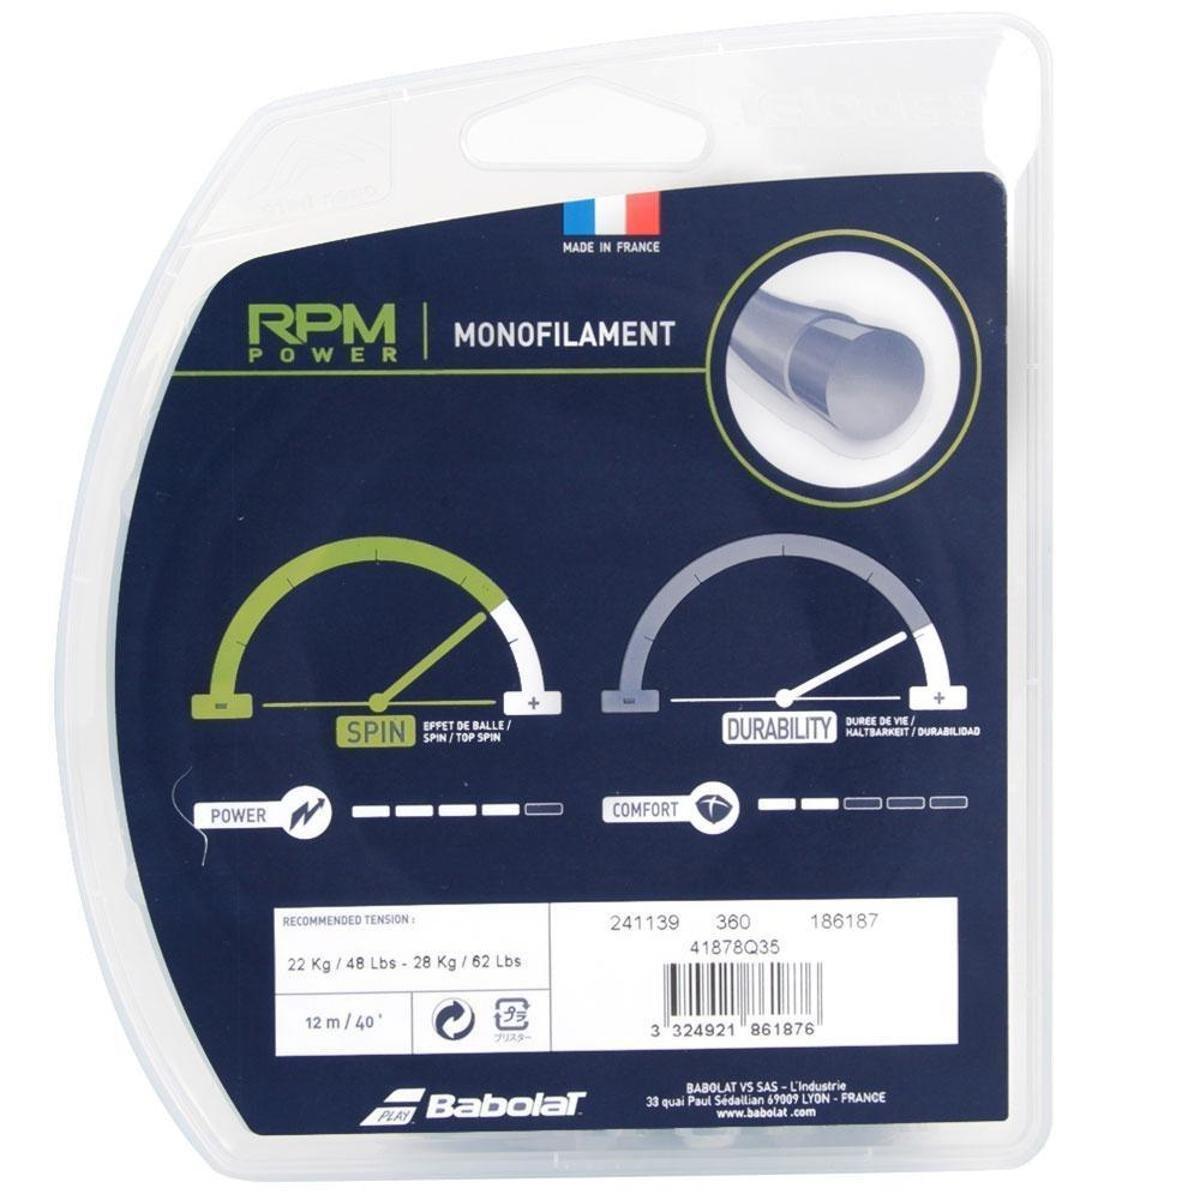 Corda Babolat RPM Power 17L - Set Individual  - PROTENISTA